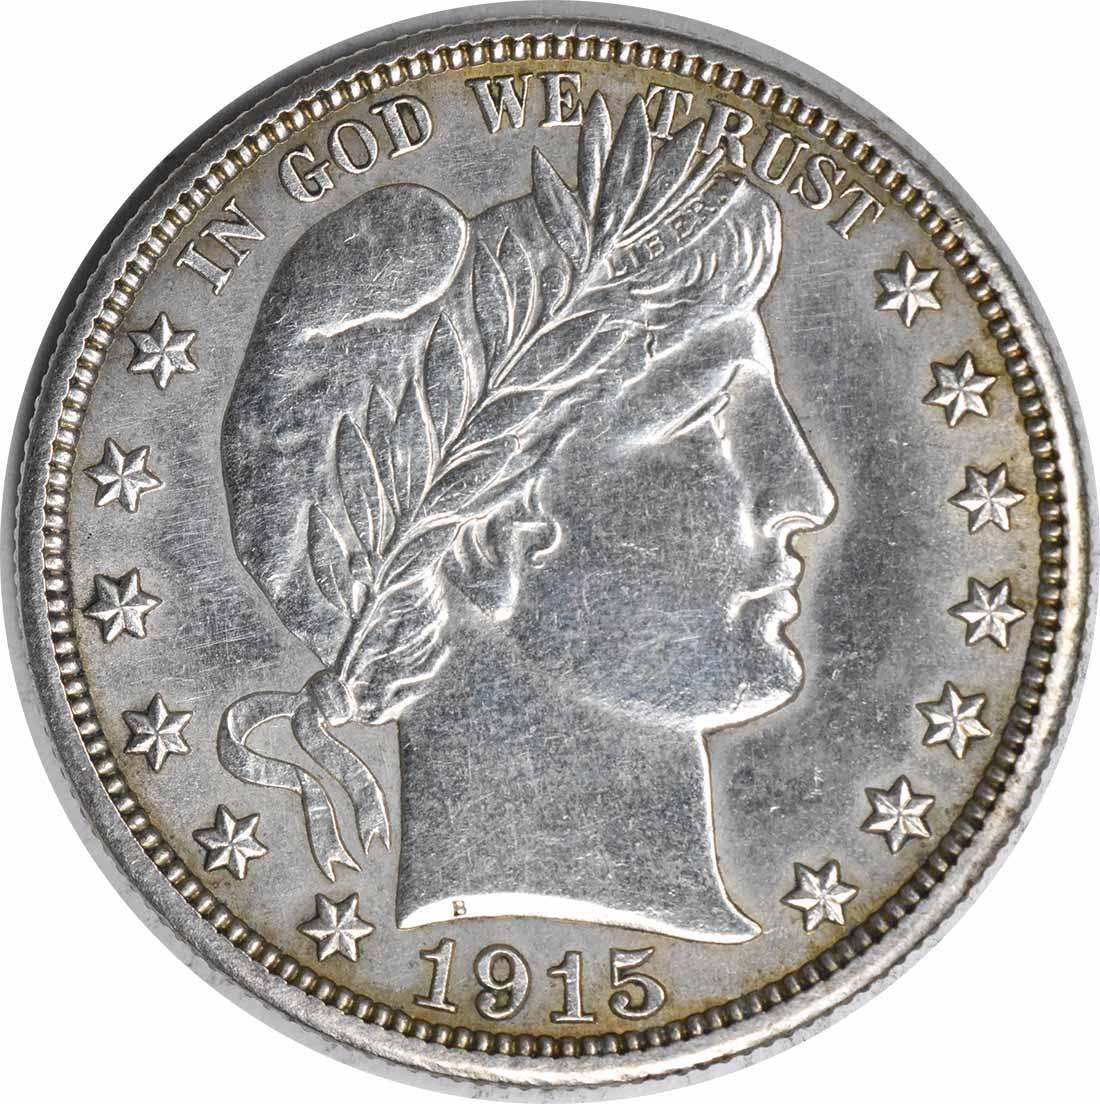 1915-S Barber Silver Half Dollar AU Uncertified #949